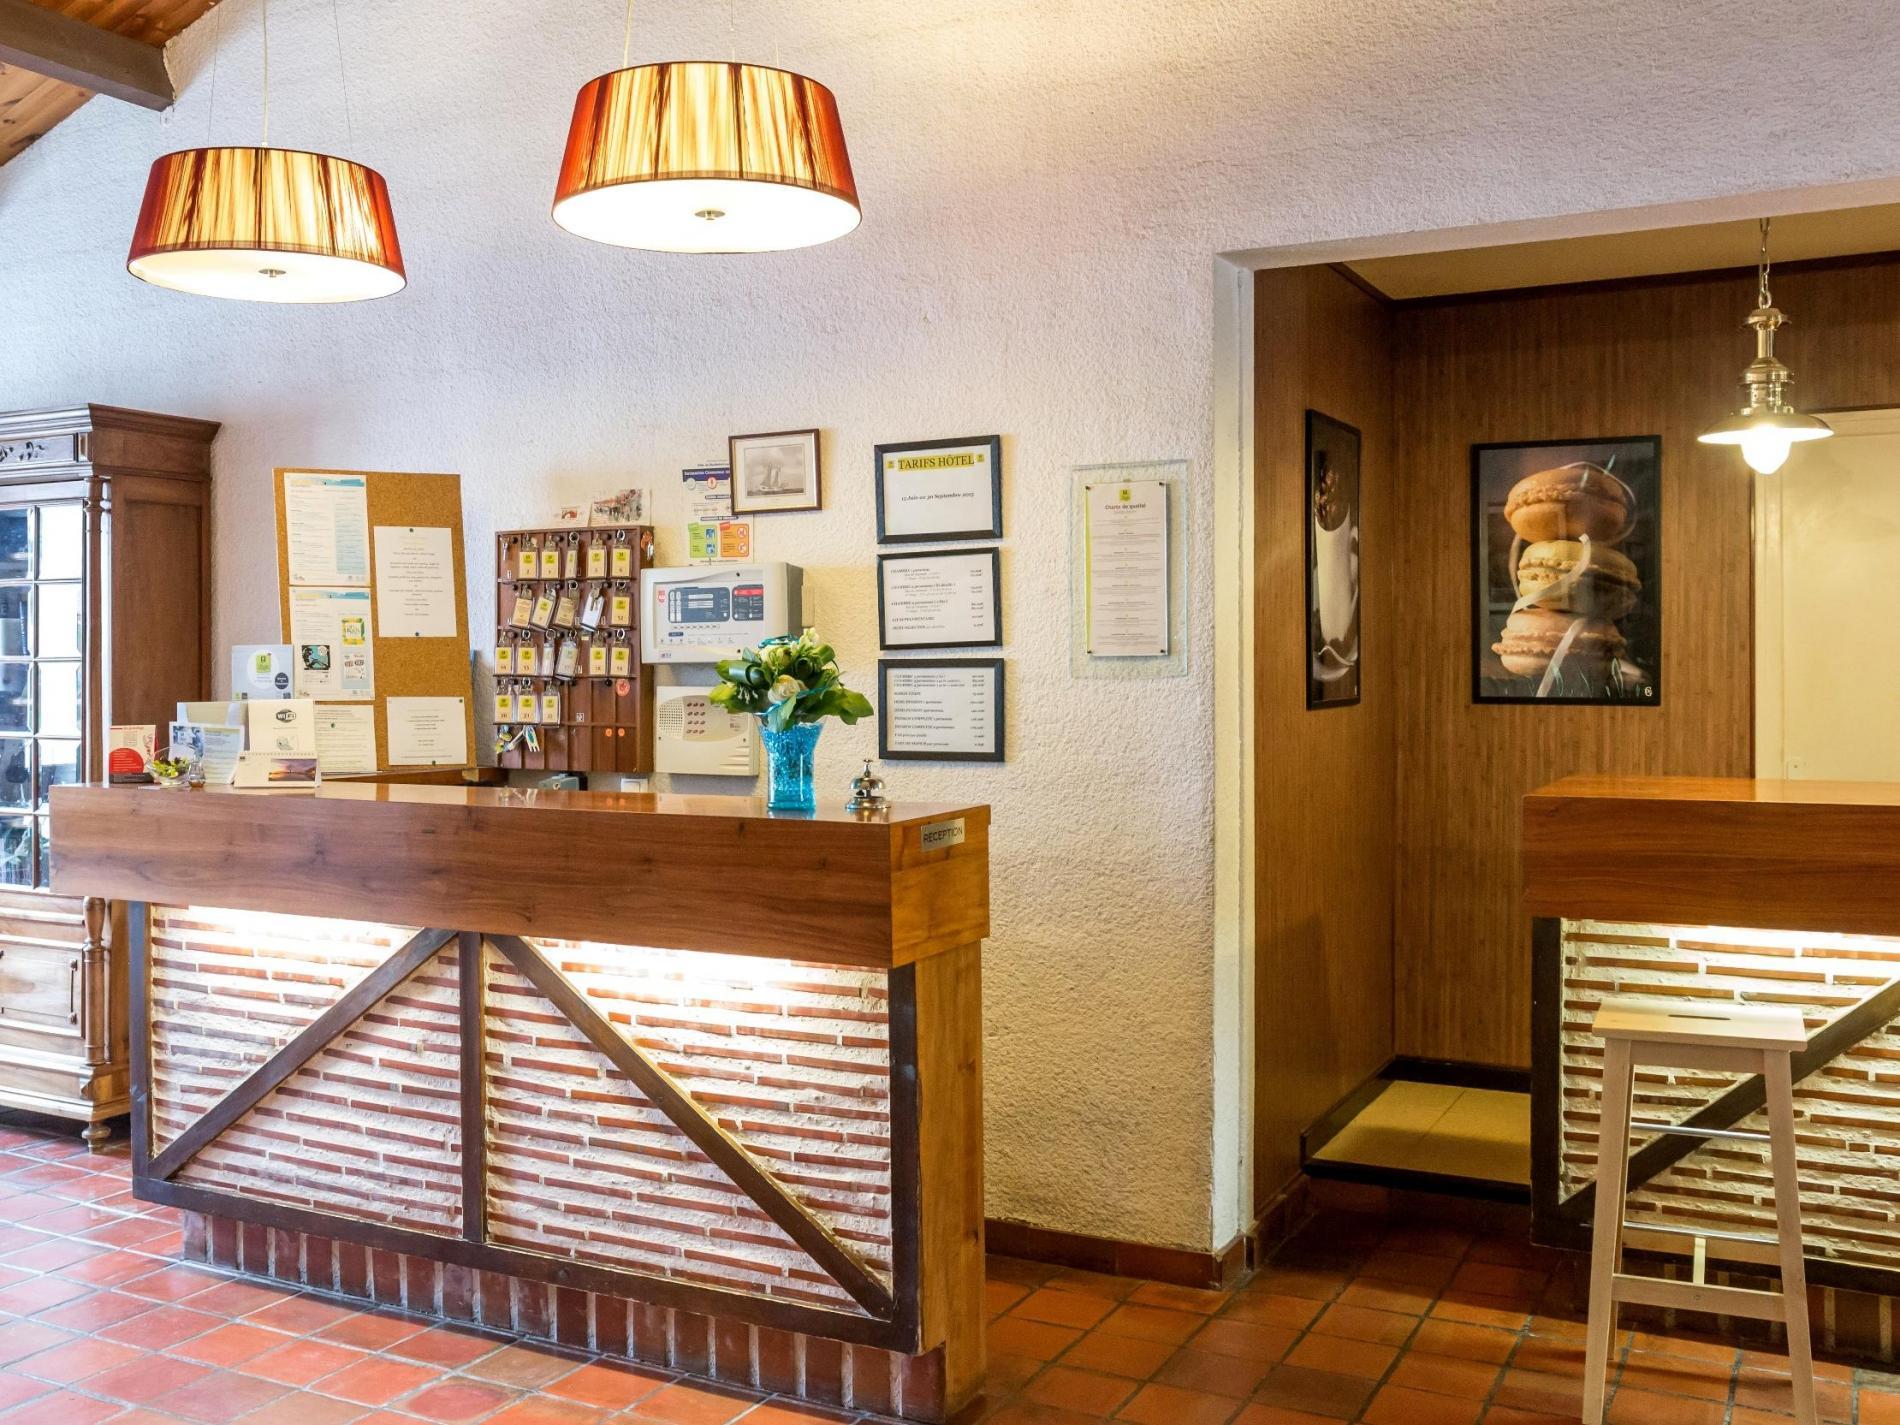 Hotel La Belle Poule